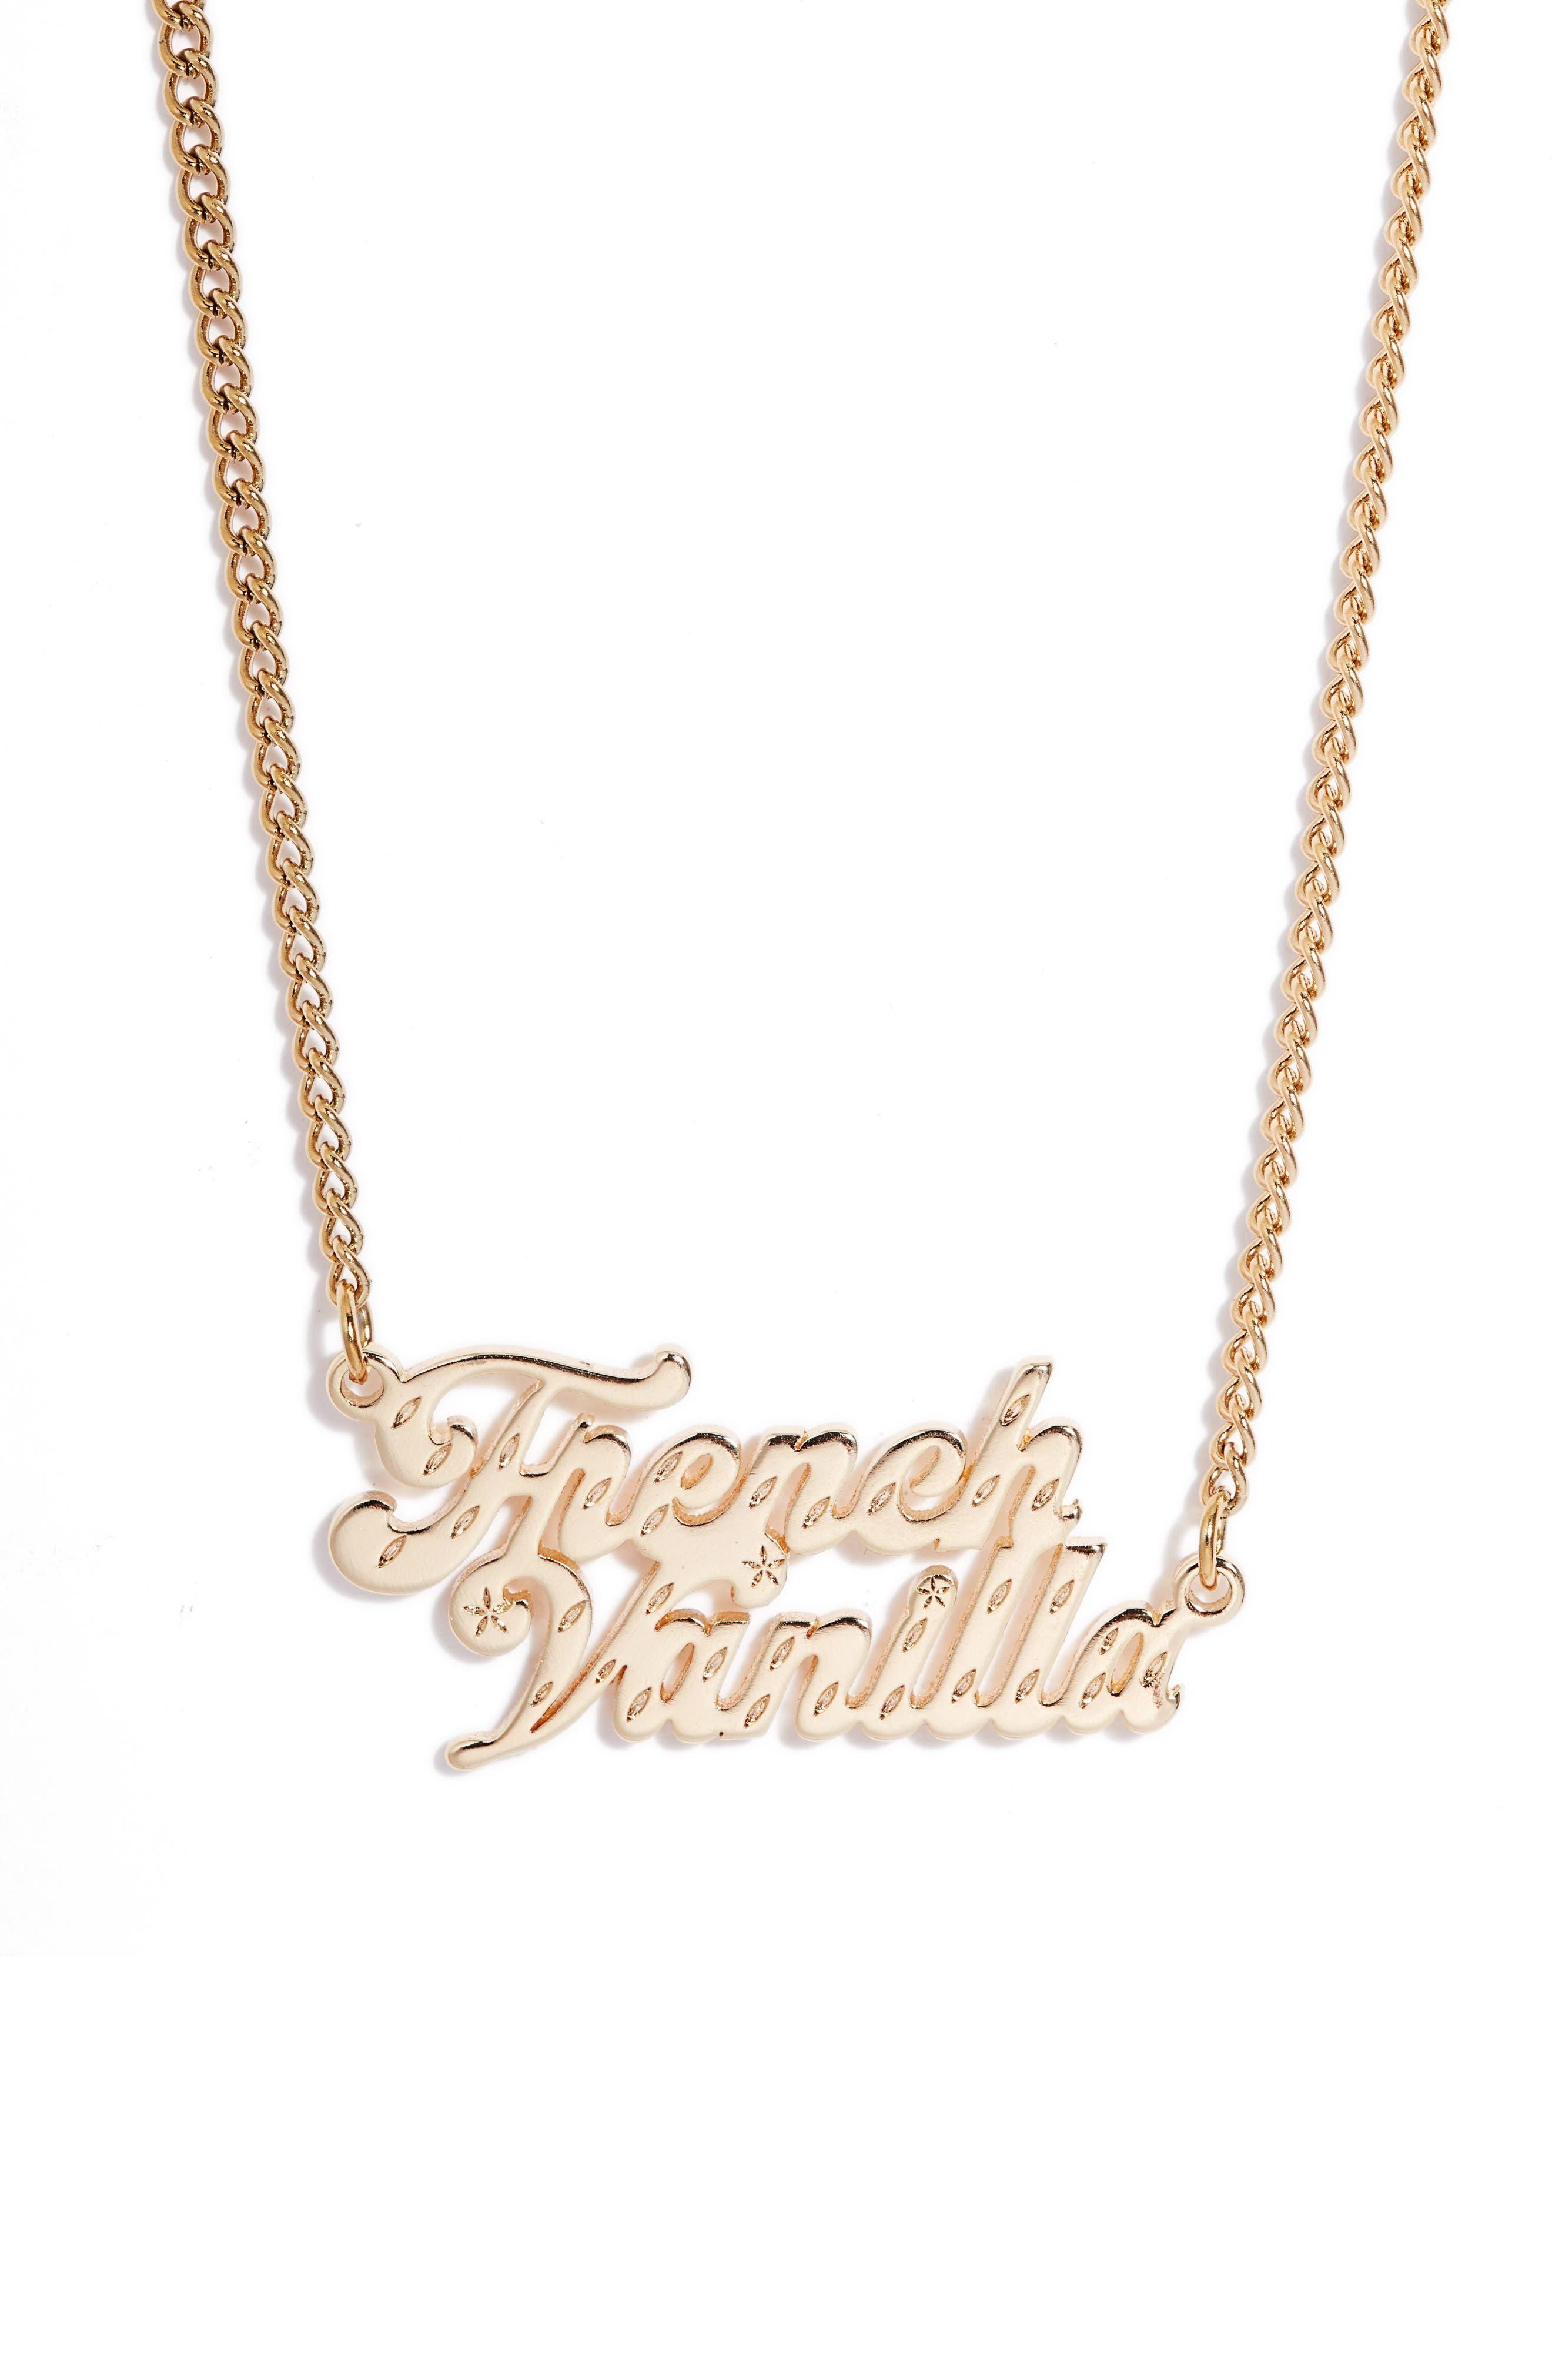 French Vanilla Ice Cream Pendant Necklace